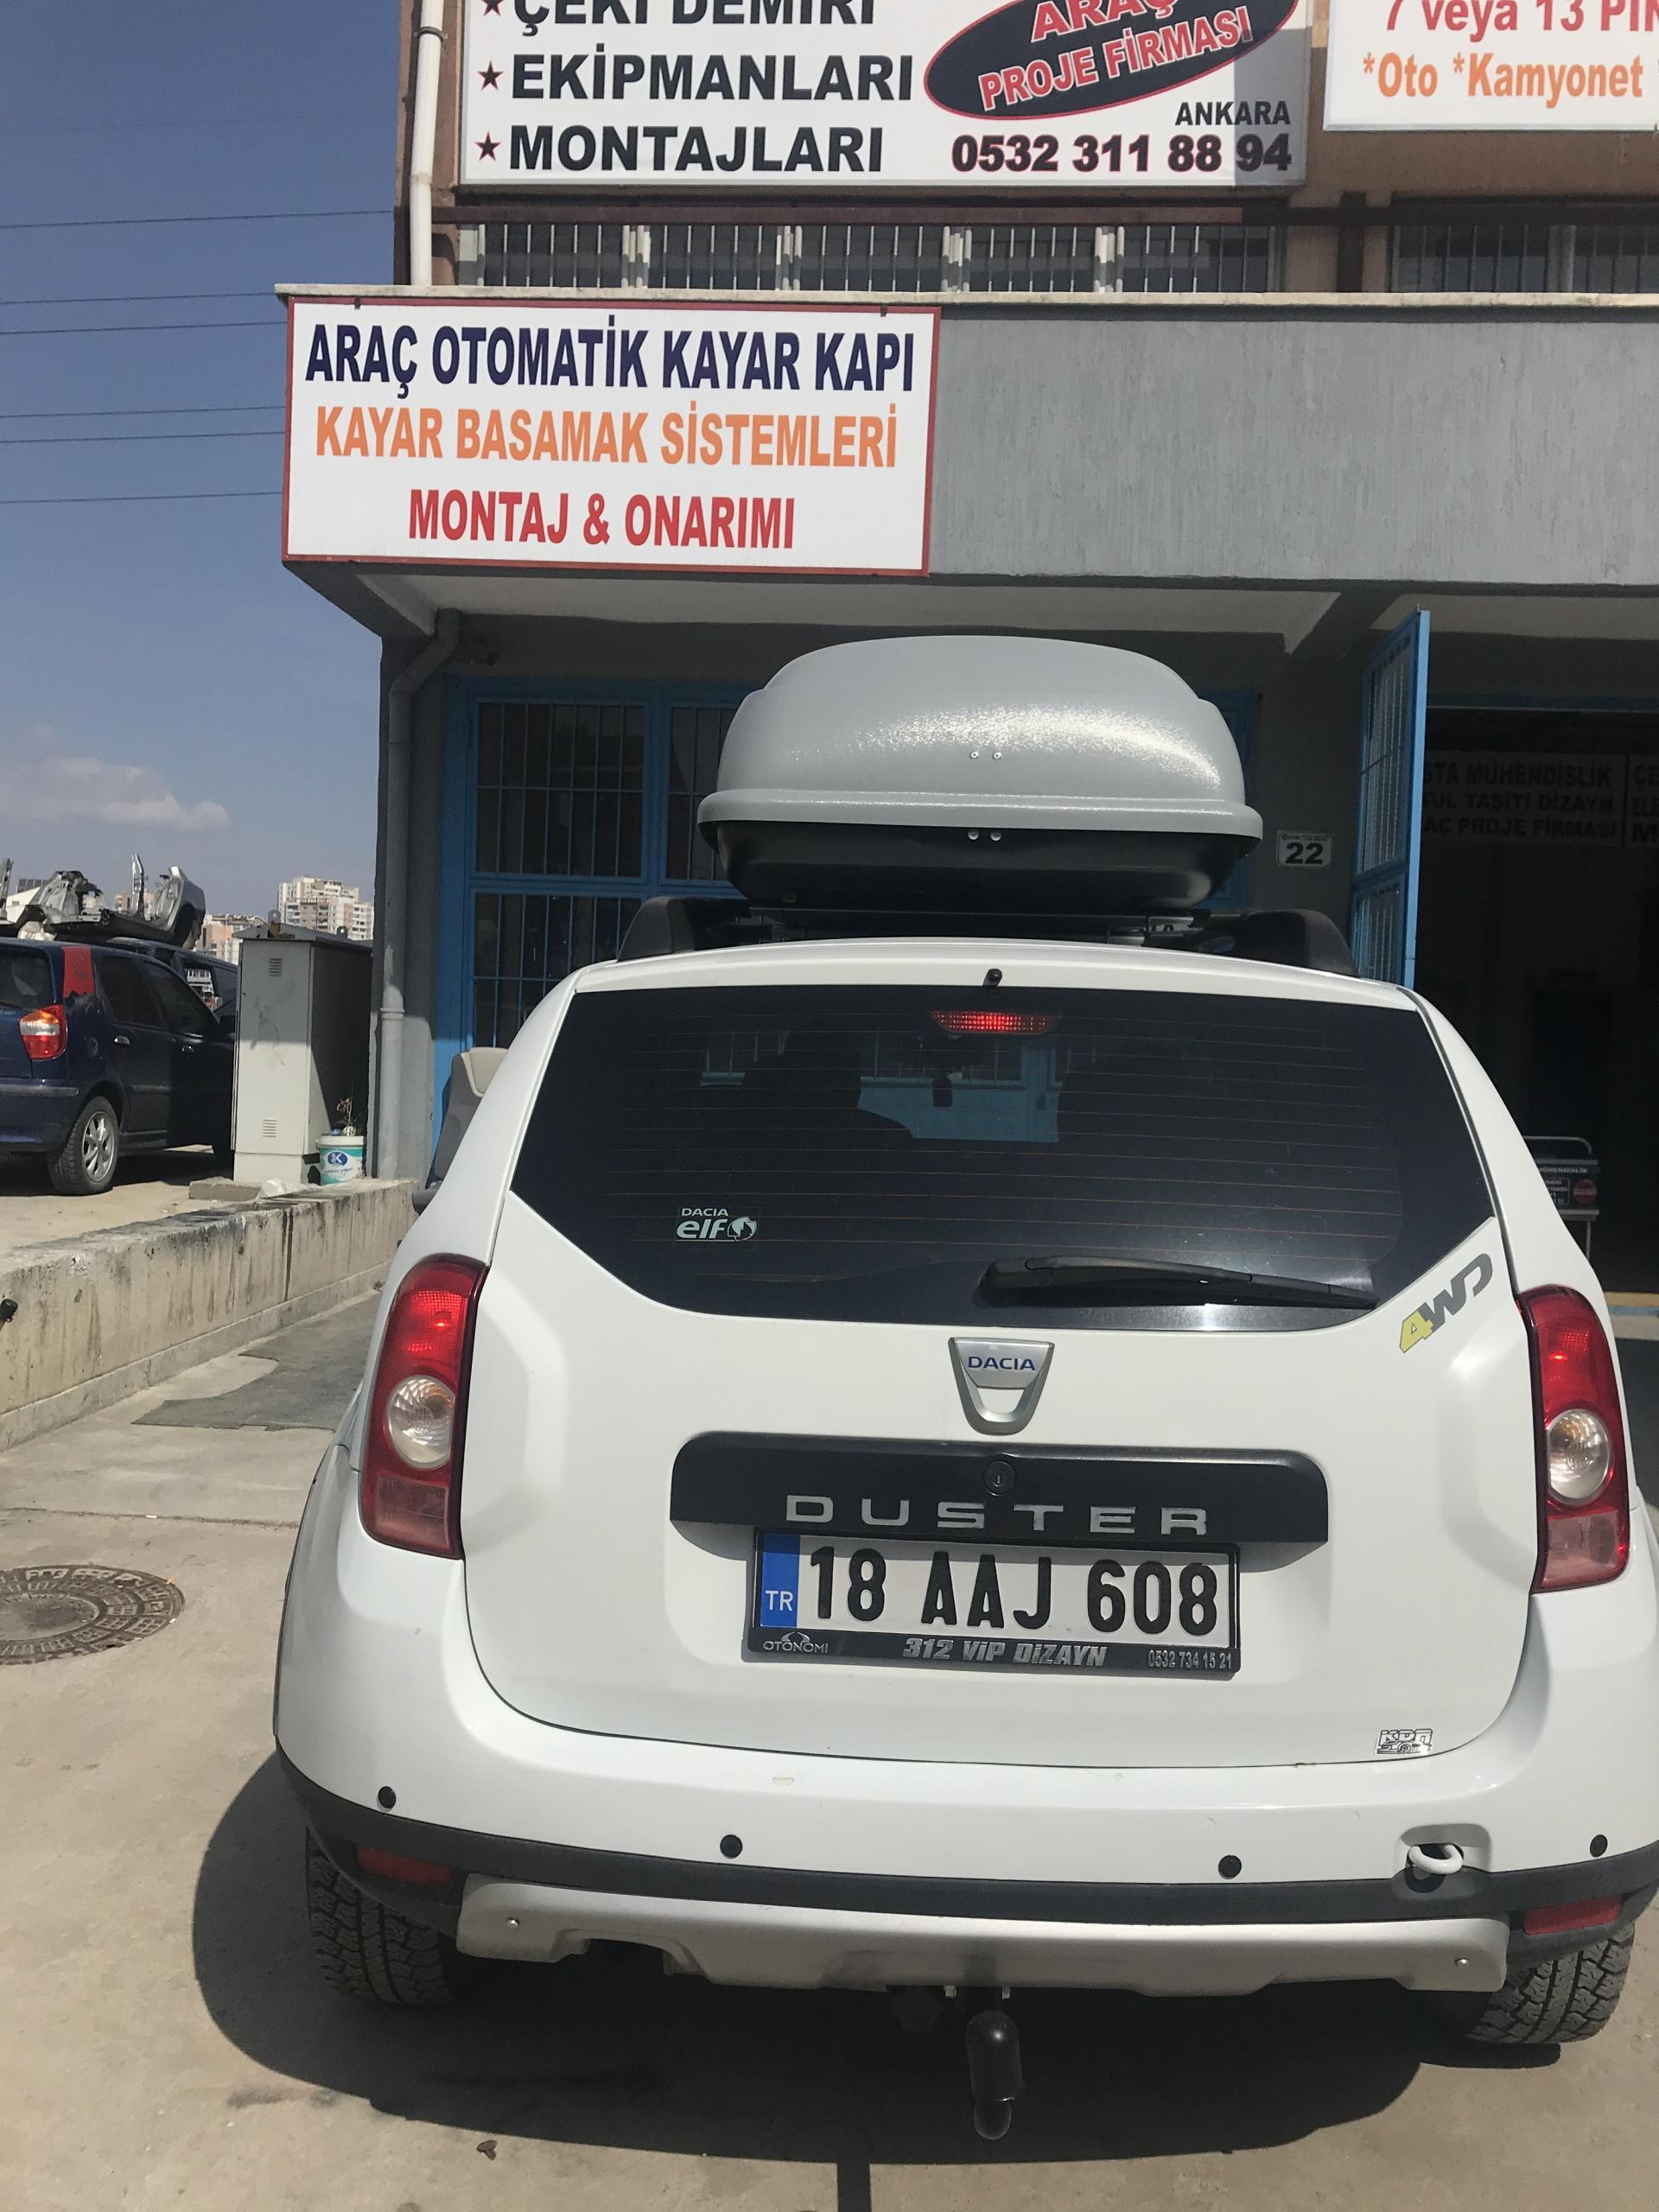 DACİA DUSTER ÇEKİ DEMİRİ TAKMA BALAMA MONTAJI ANKARA